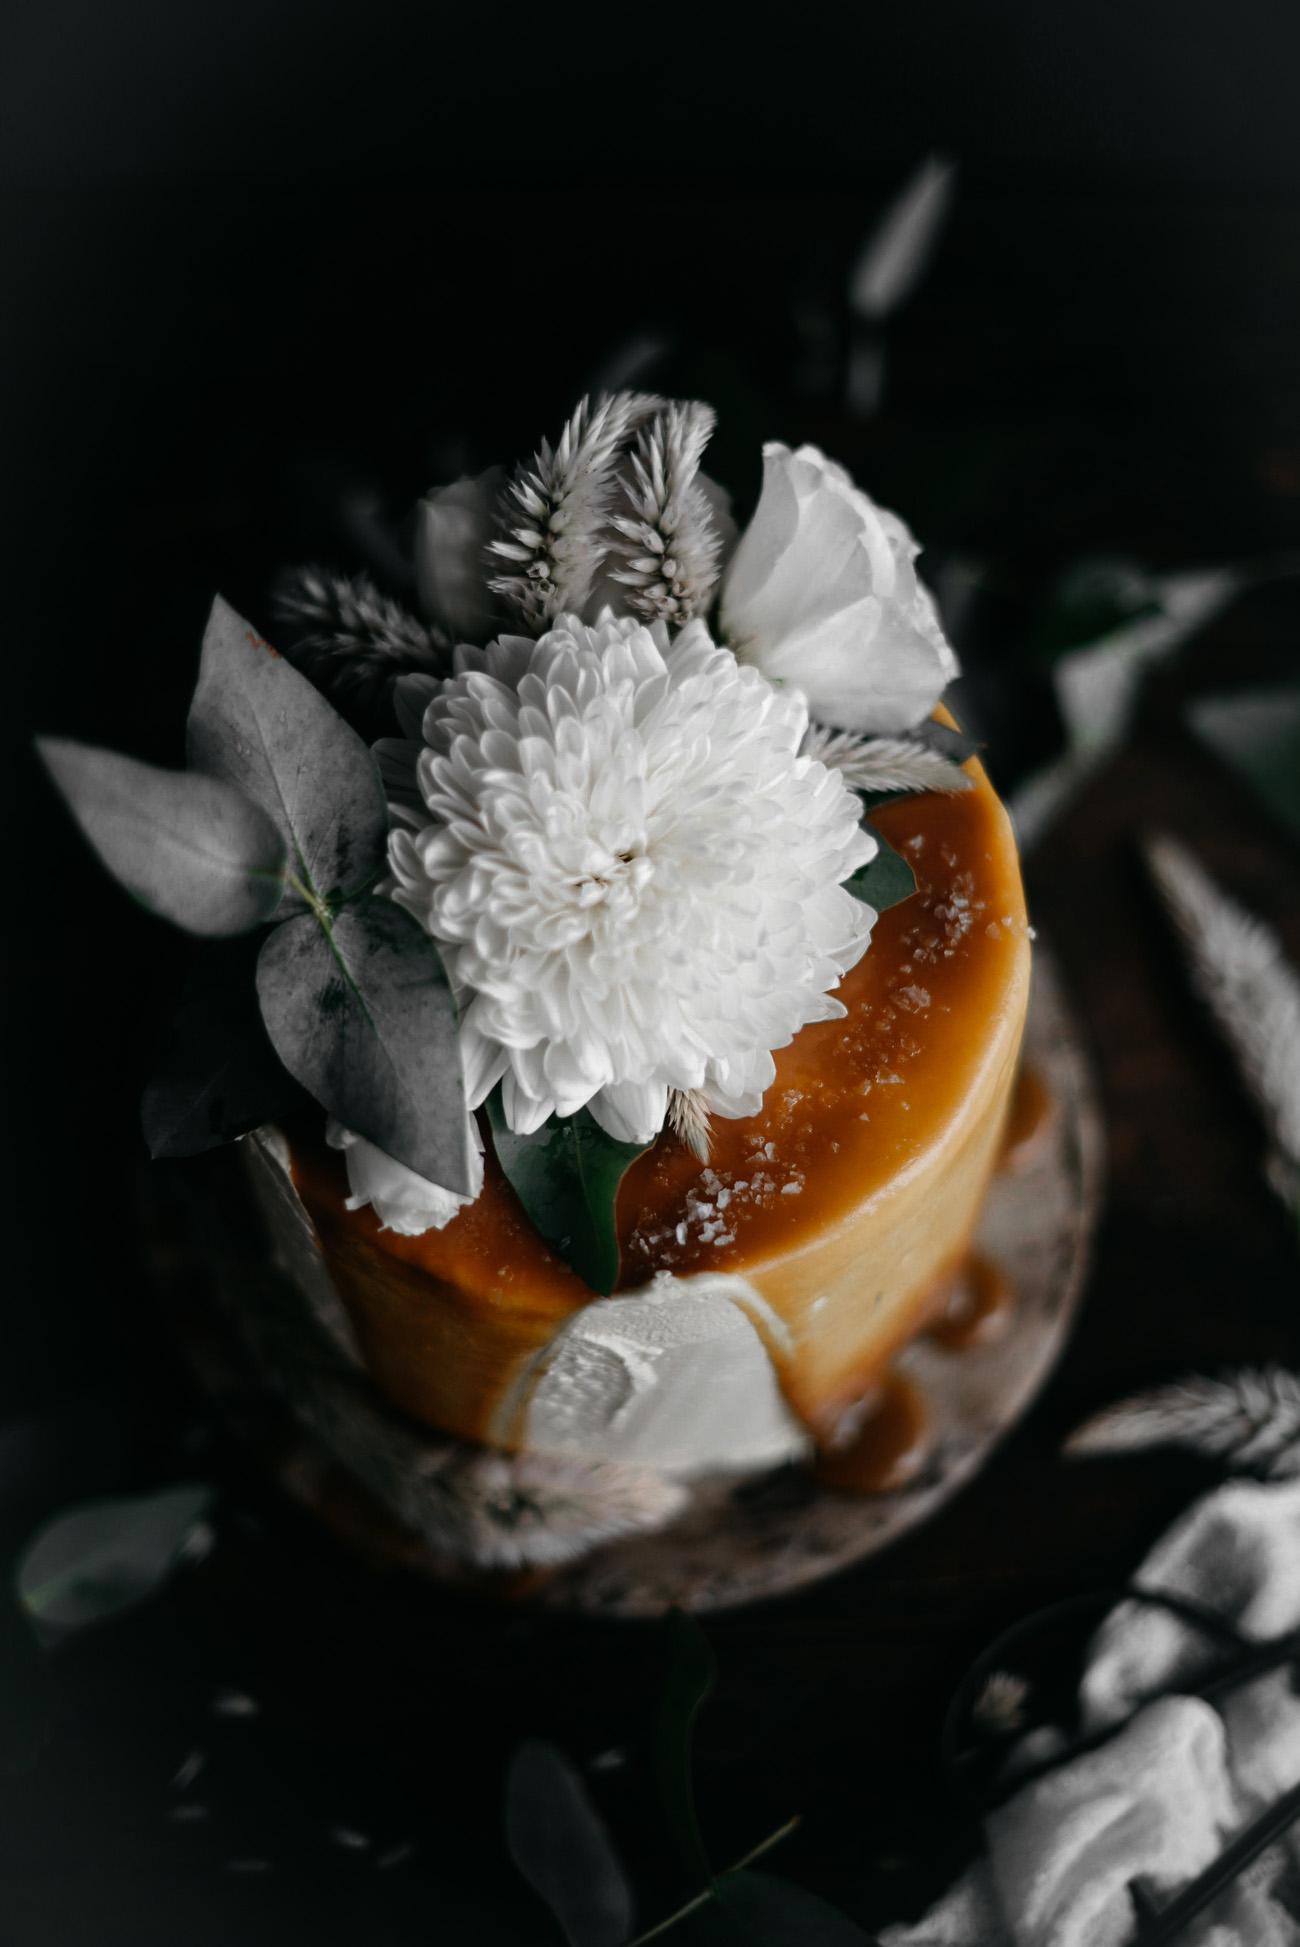 Italian-Orange-Blossom-and-Almond-Cake-with-Orange-Curd-Mascarpone-Swiss-Meringue-Buttercream-and-Fleur-d'Oranger-Caramel-8.jpg